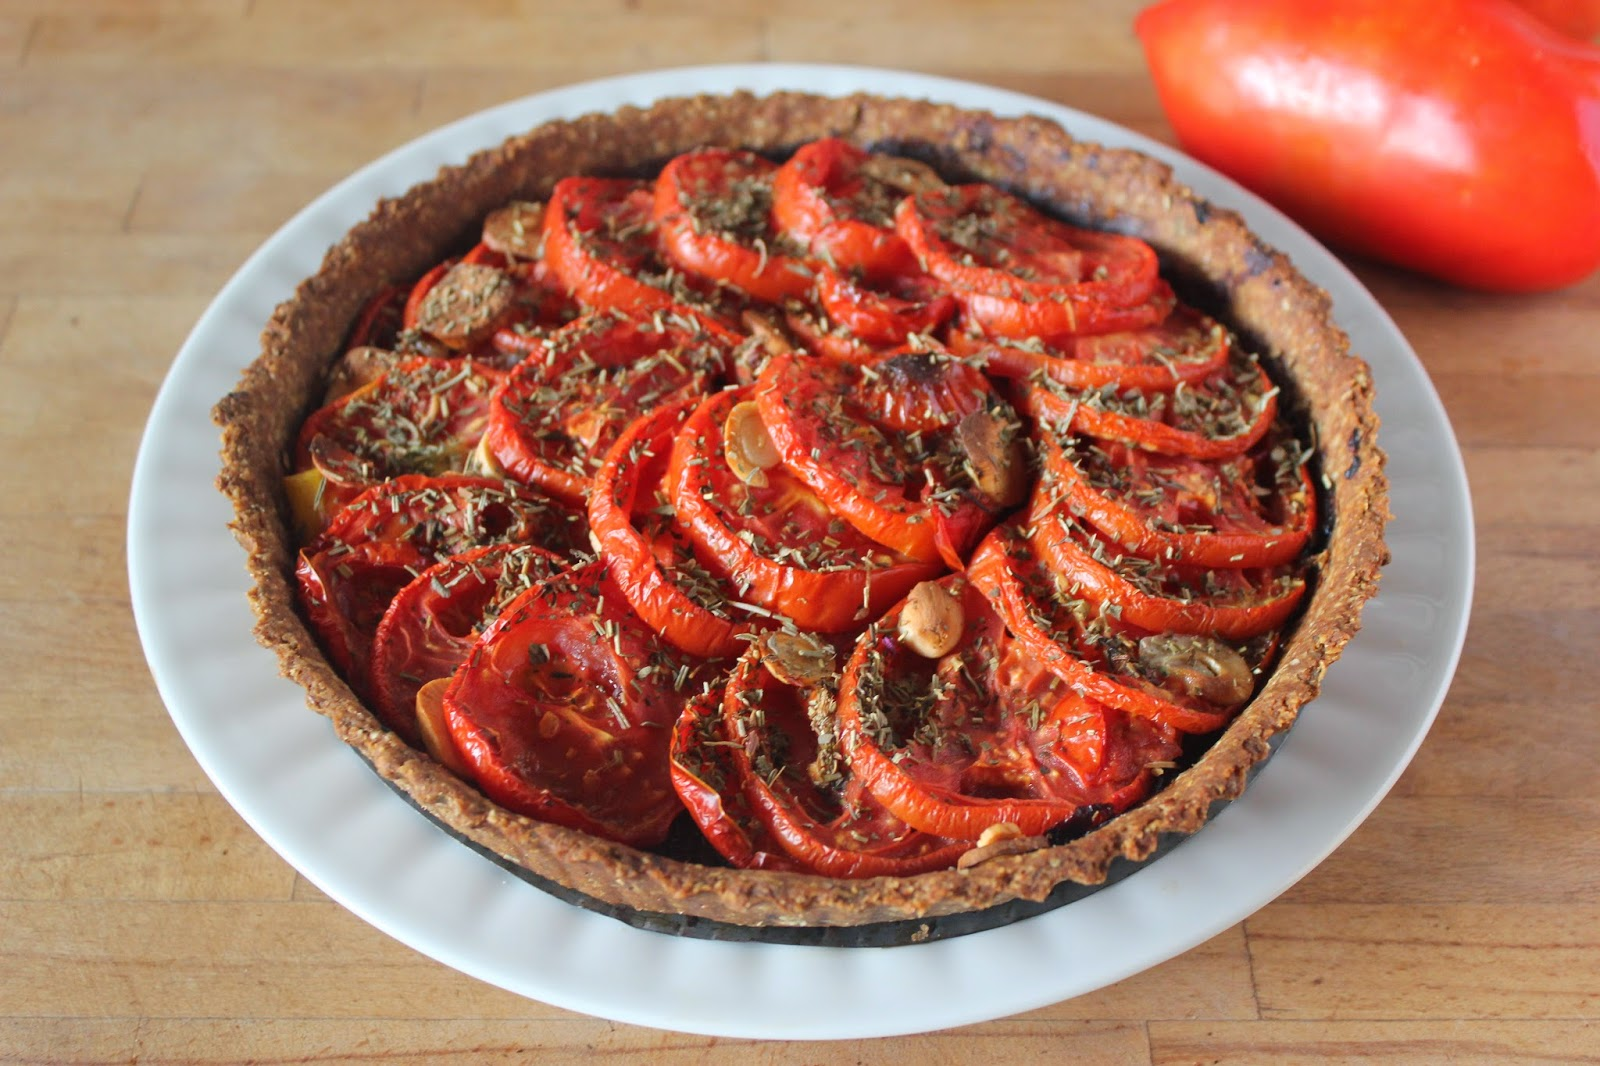 https://cuillereetsaladier.blogspot.com/2014/07/tarte-la-tomate-et-moutarde.html